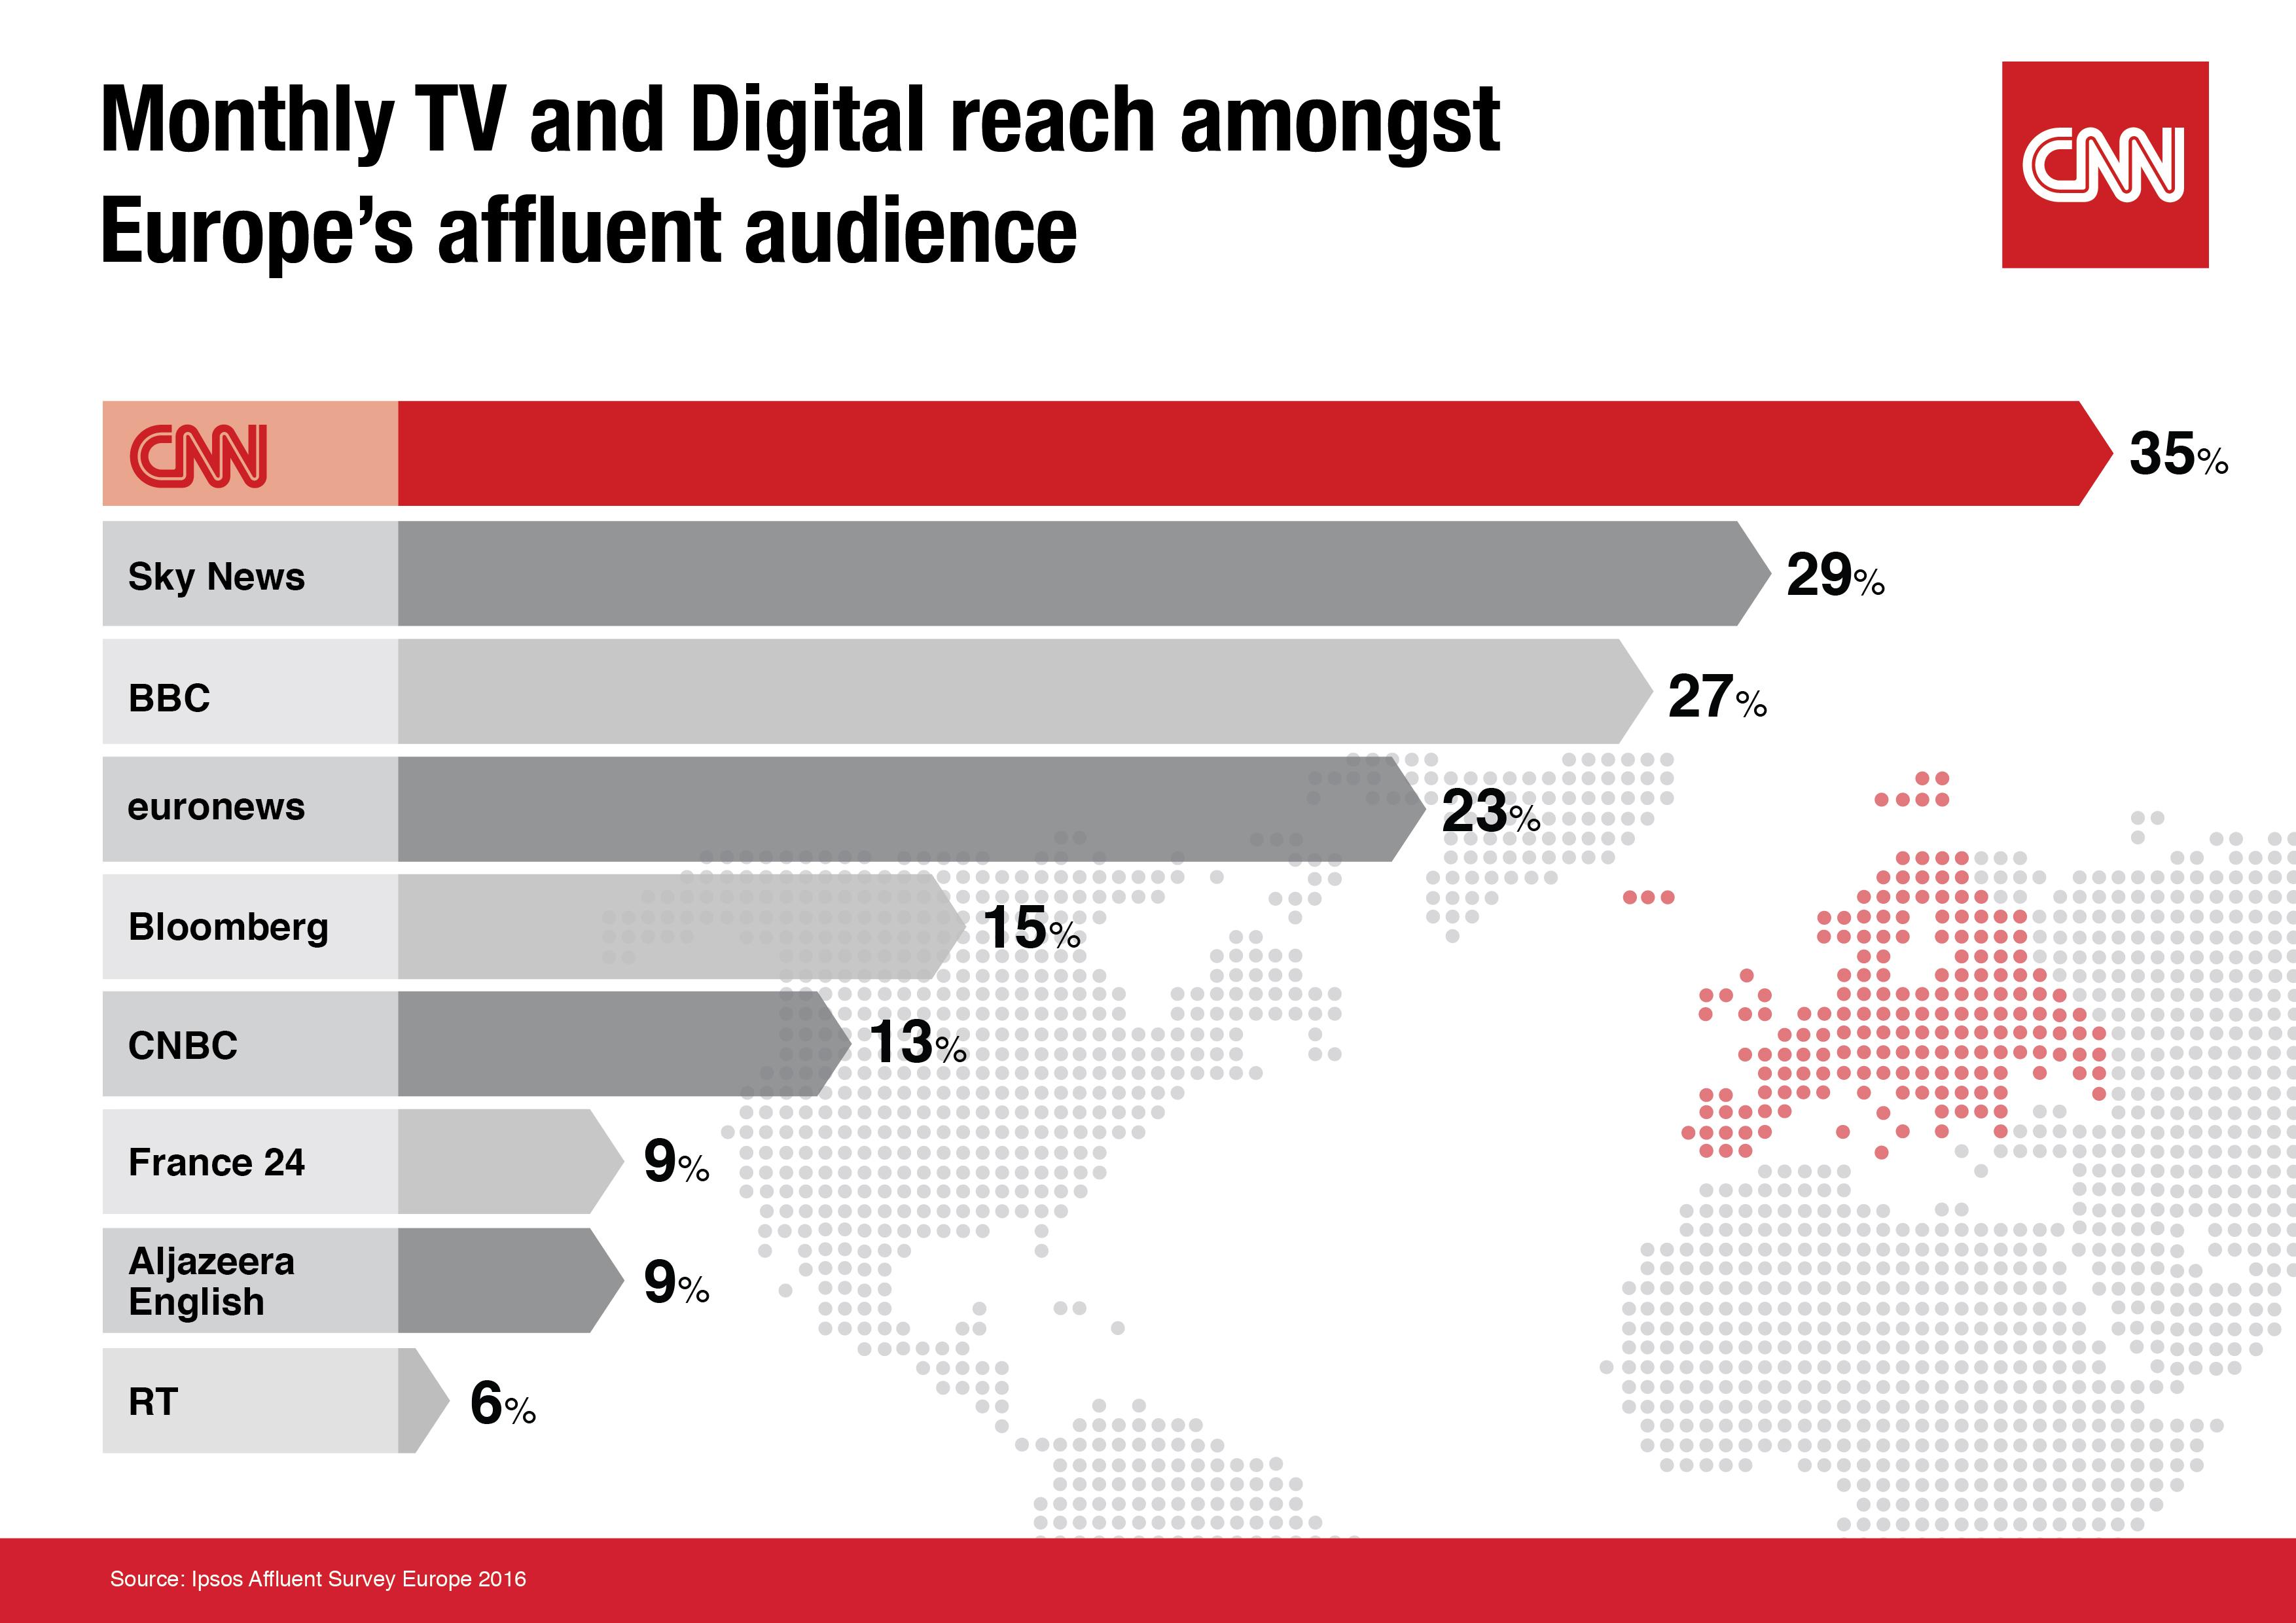 CNN is Europe's #1 international news brand